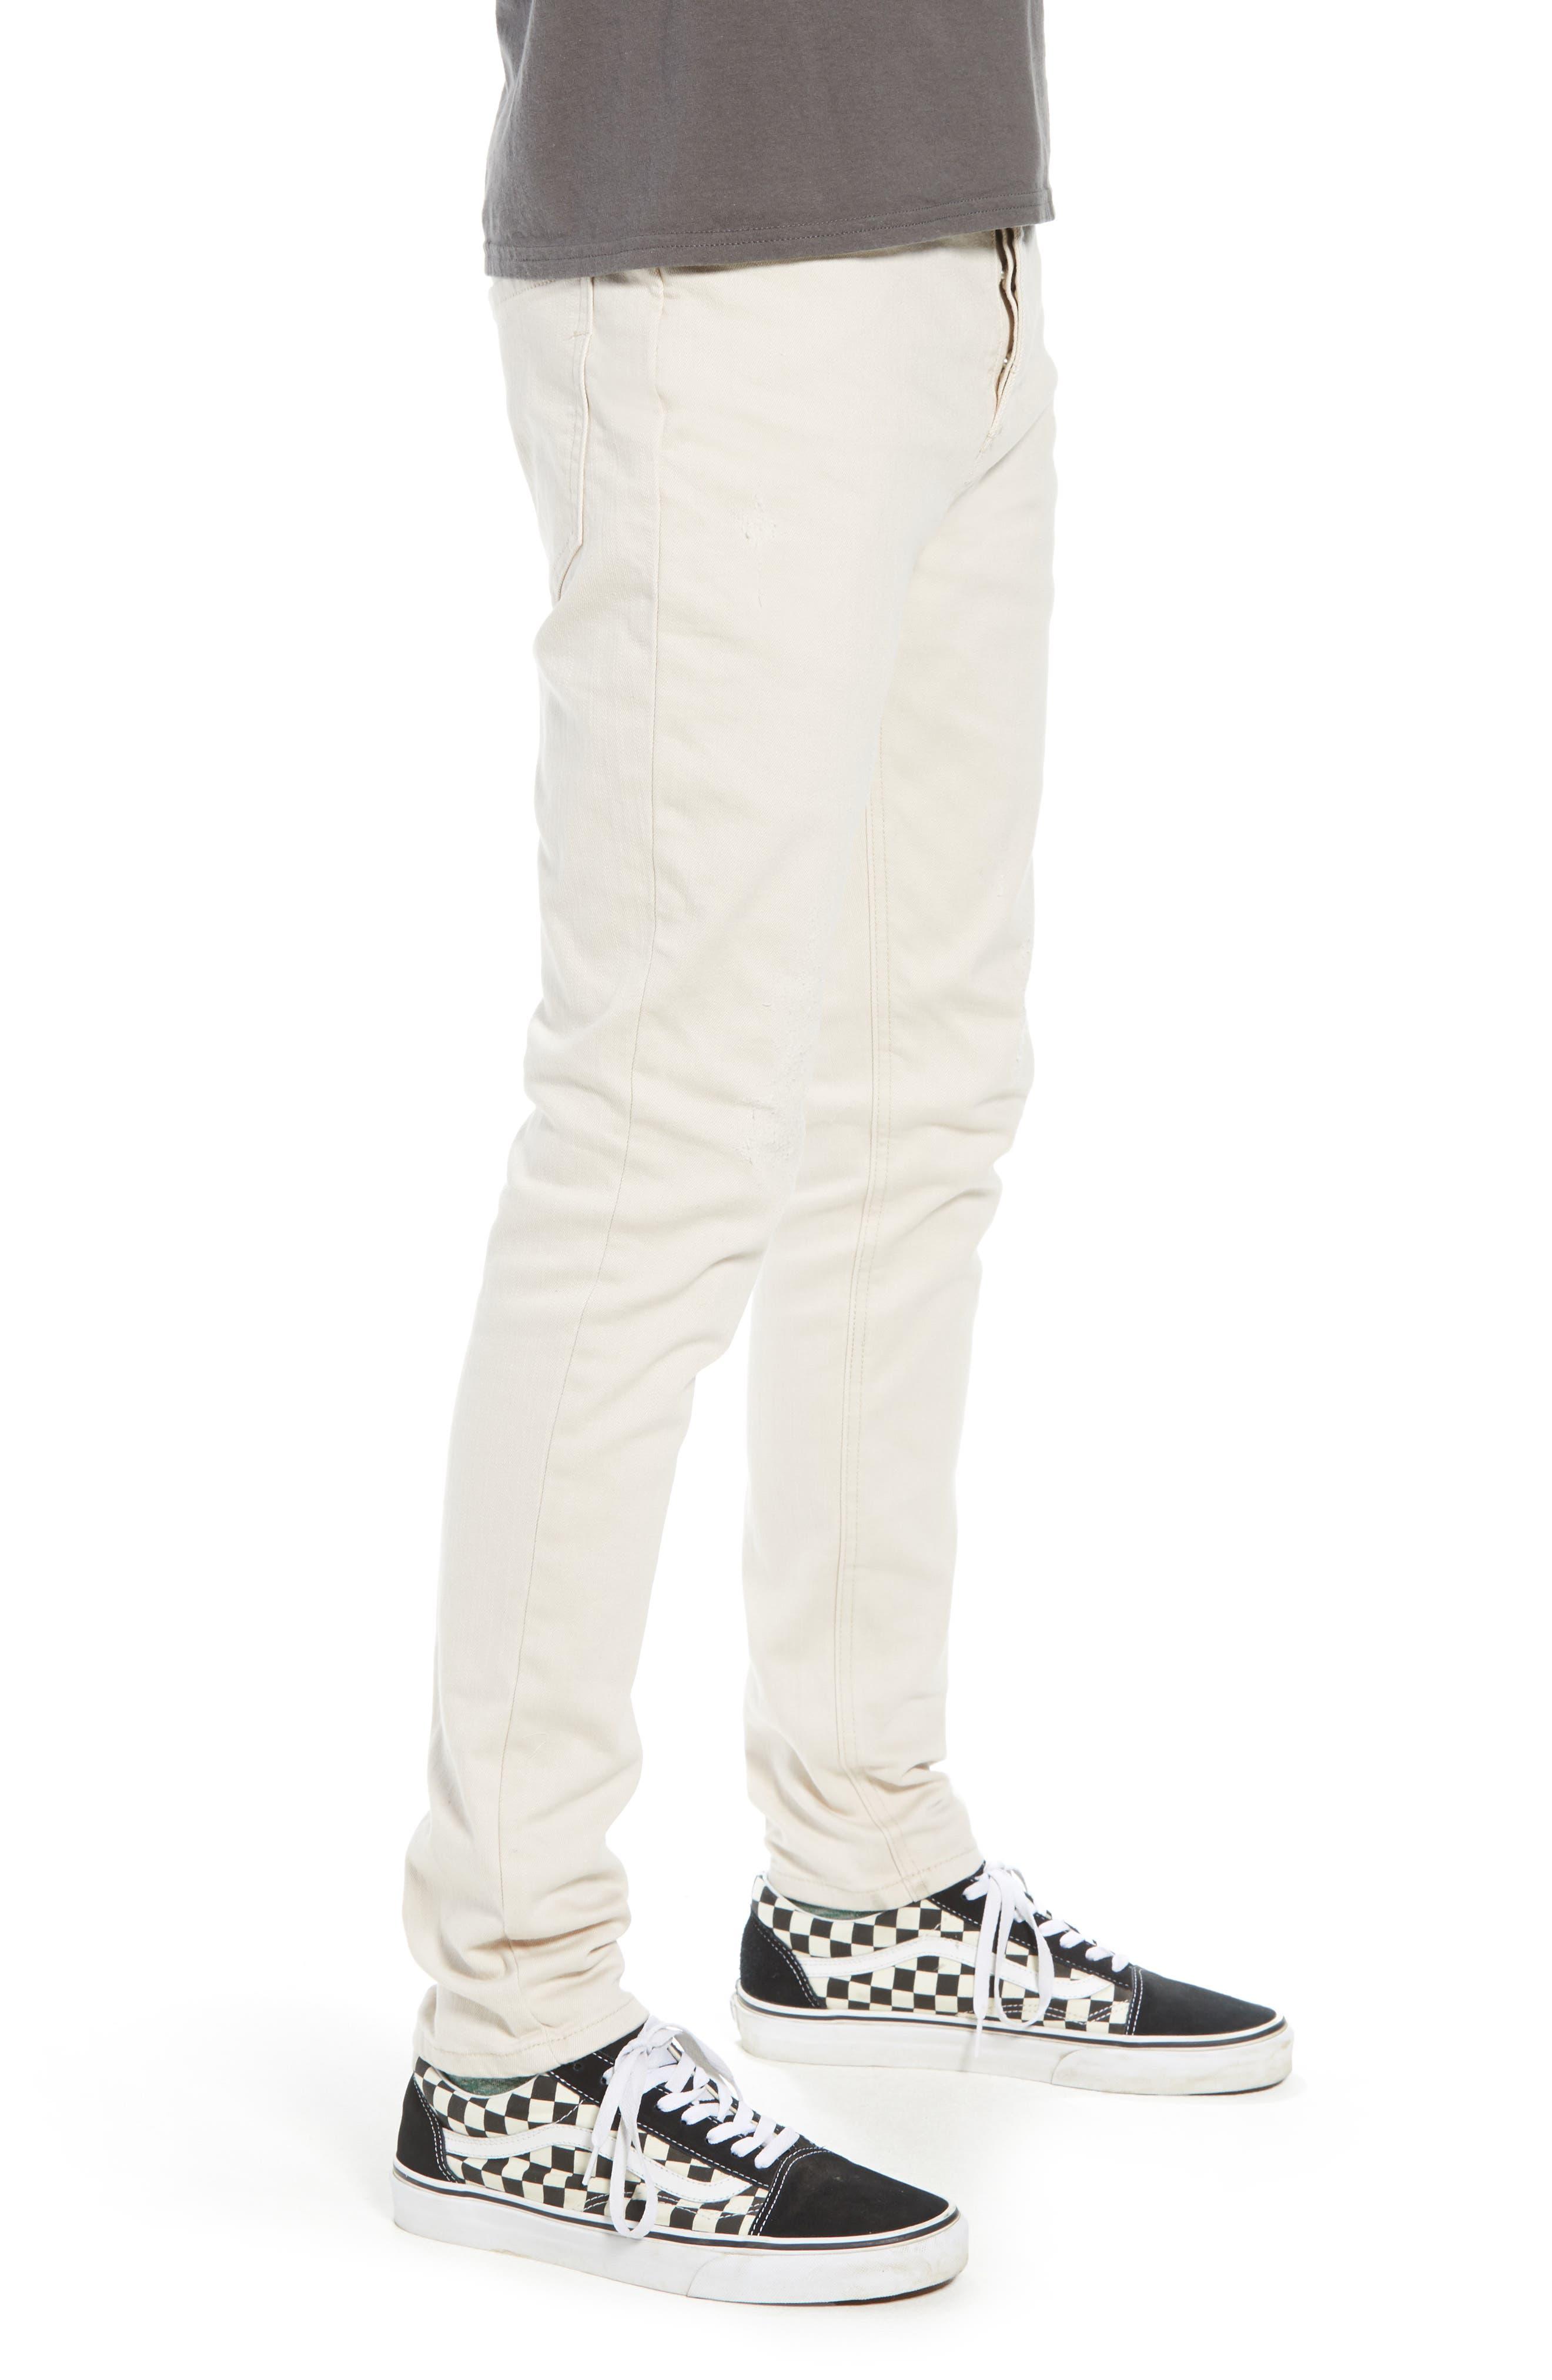 Joe Blow Slim Fit Jeans,                             Alternate thumbnail 3, color,                             901